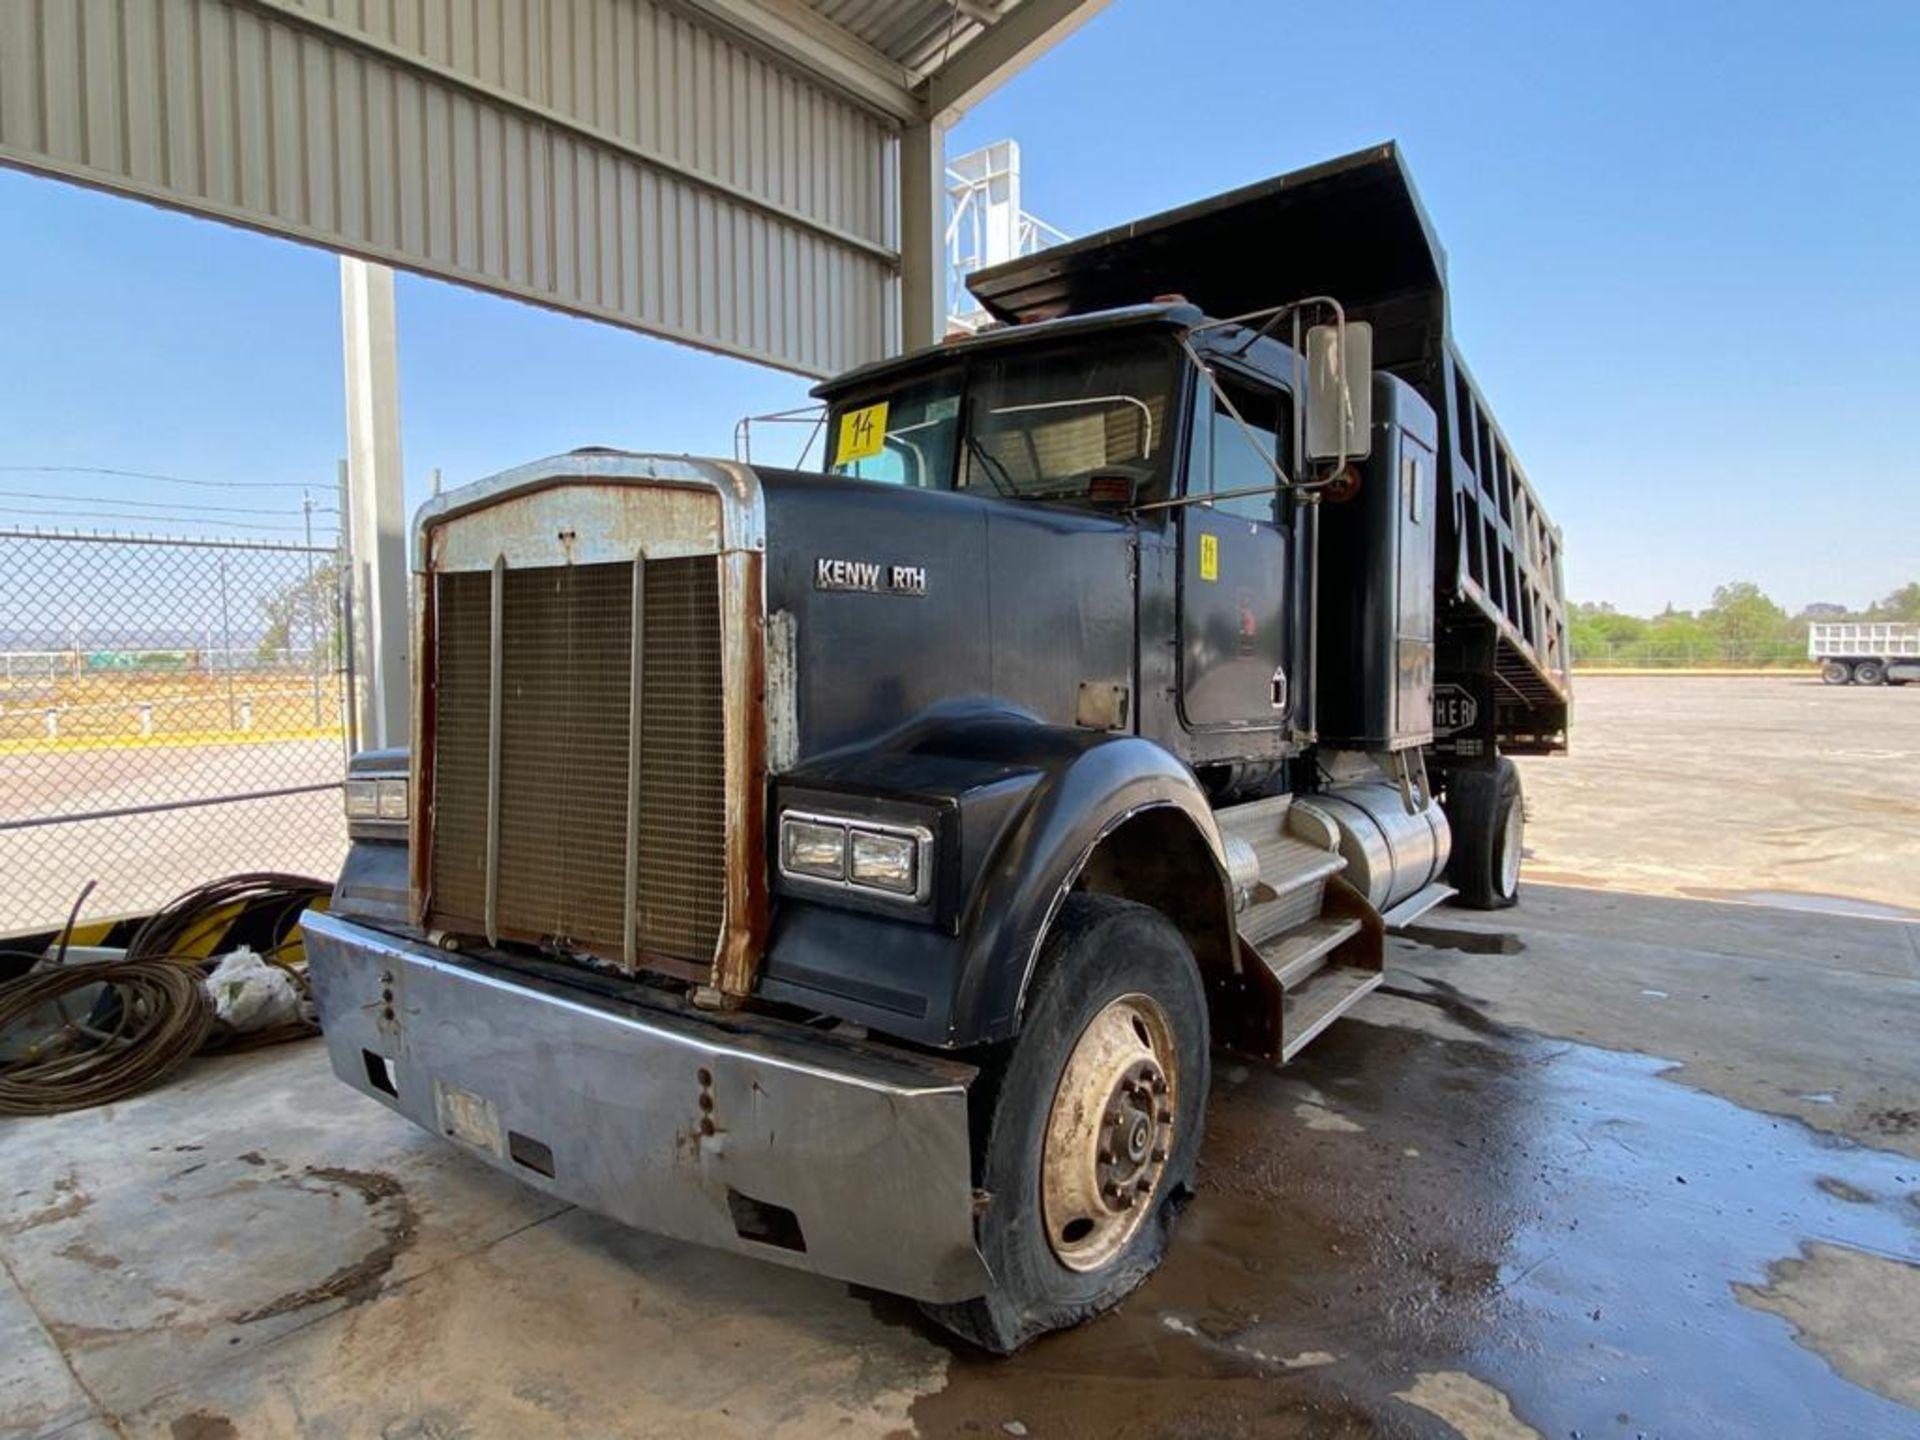 1983 Kenworth Dump Truck, standard transmission of 10 speeds, with Cummins motor - Image 5 of 68